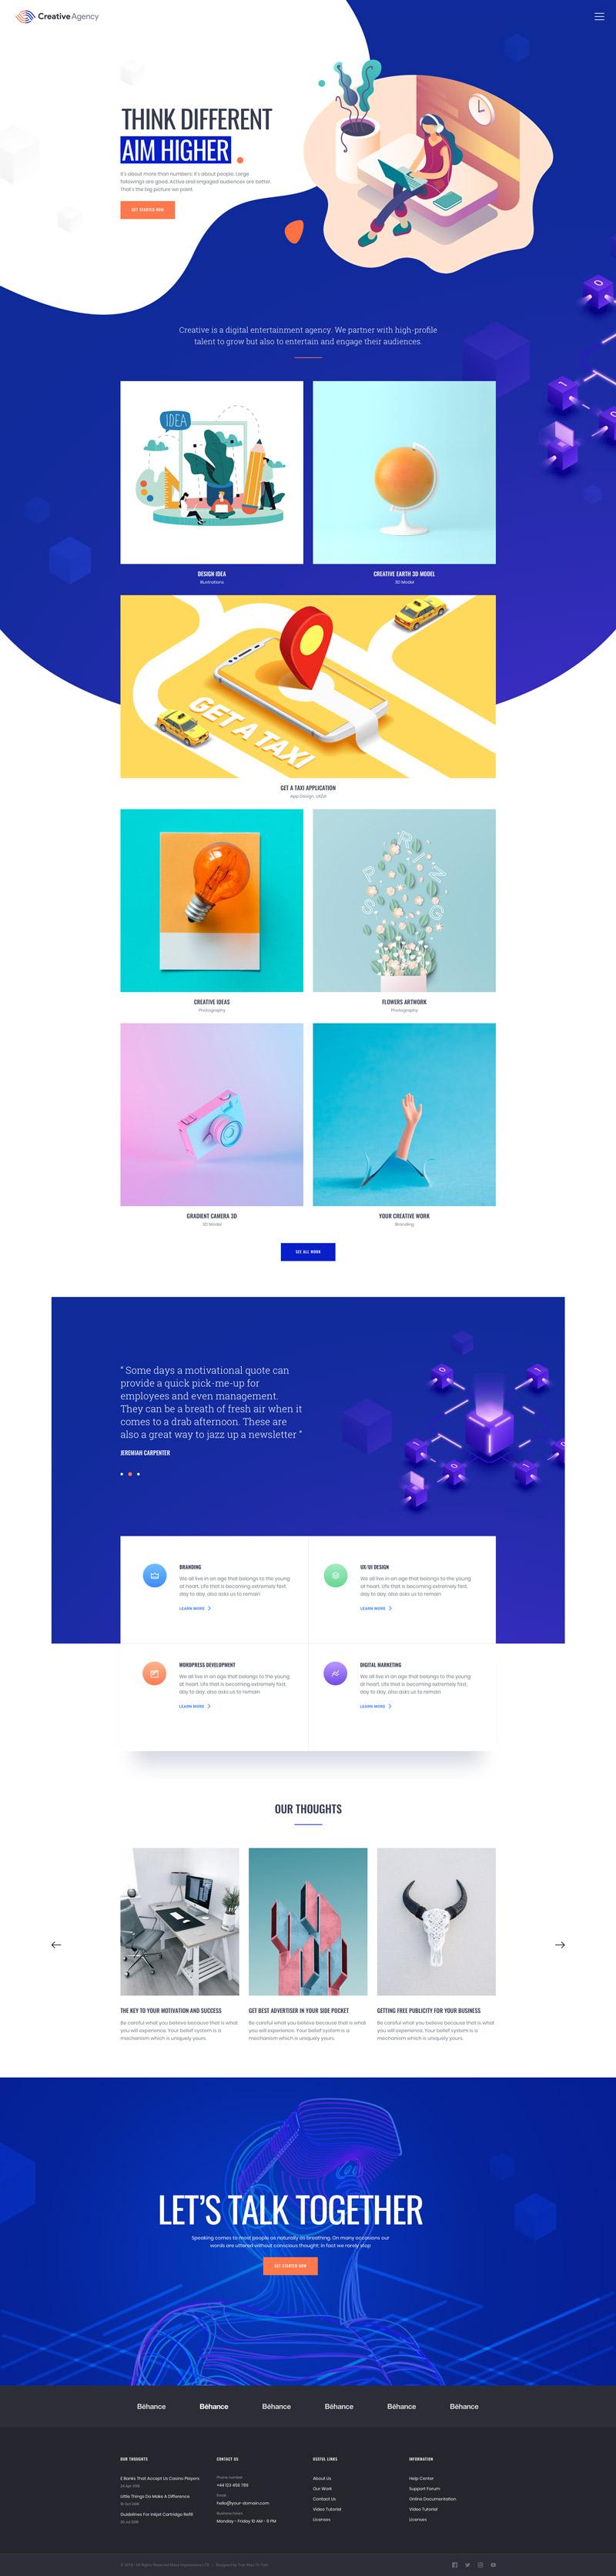 MI CREATIVE - 视觉设计web模板草图设计素材(sketch源文件格式下载)